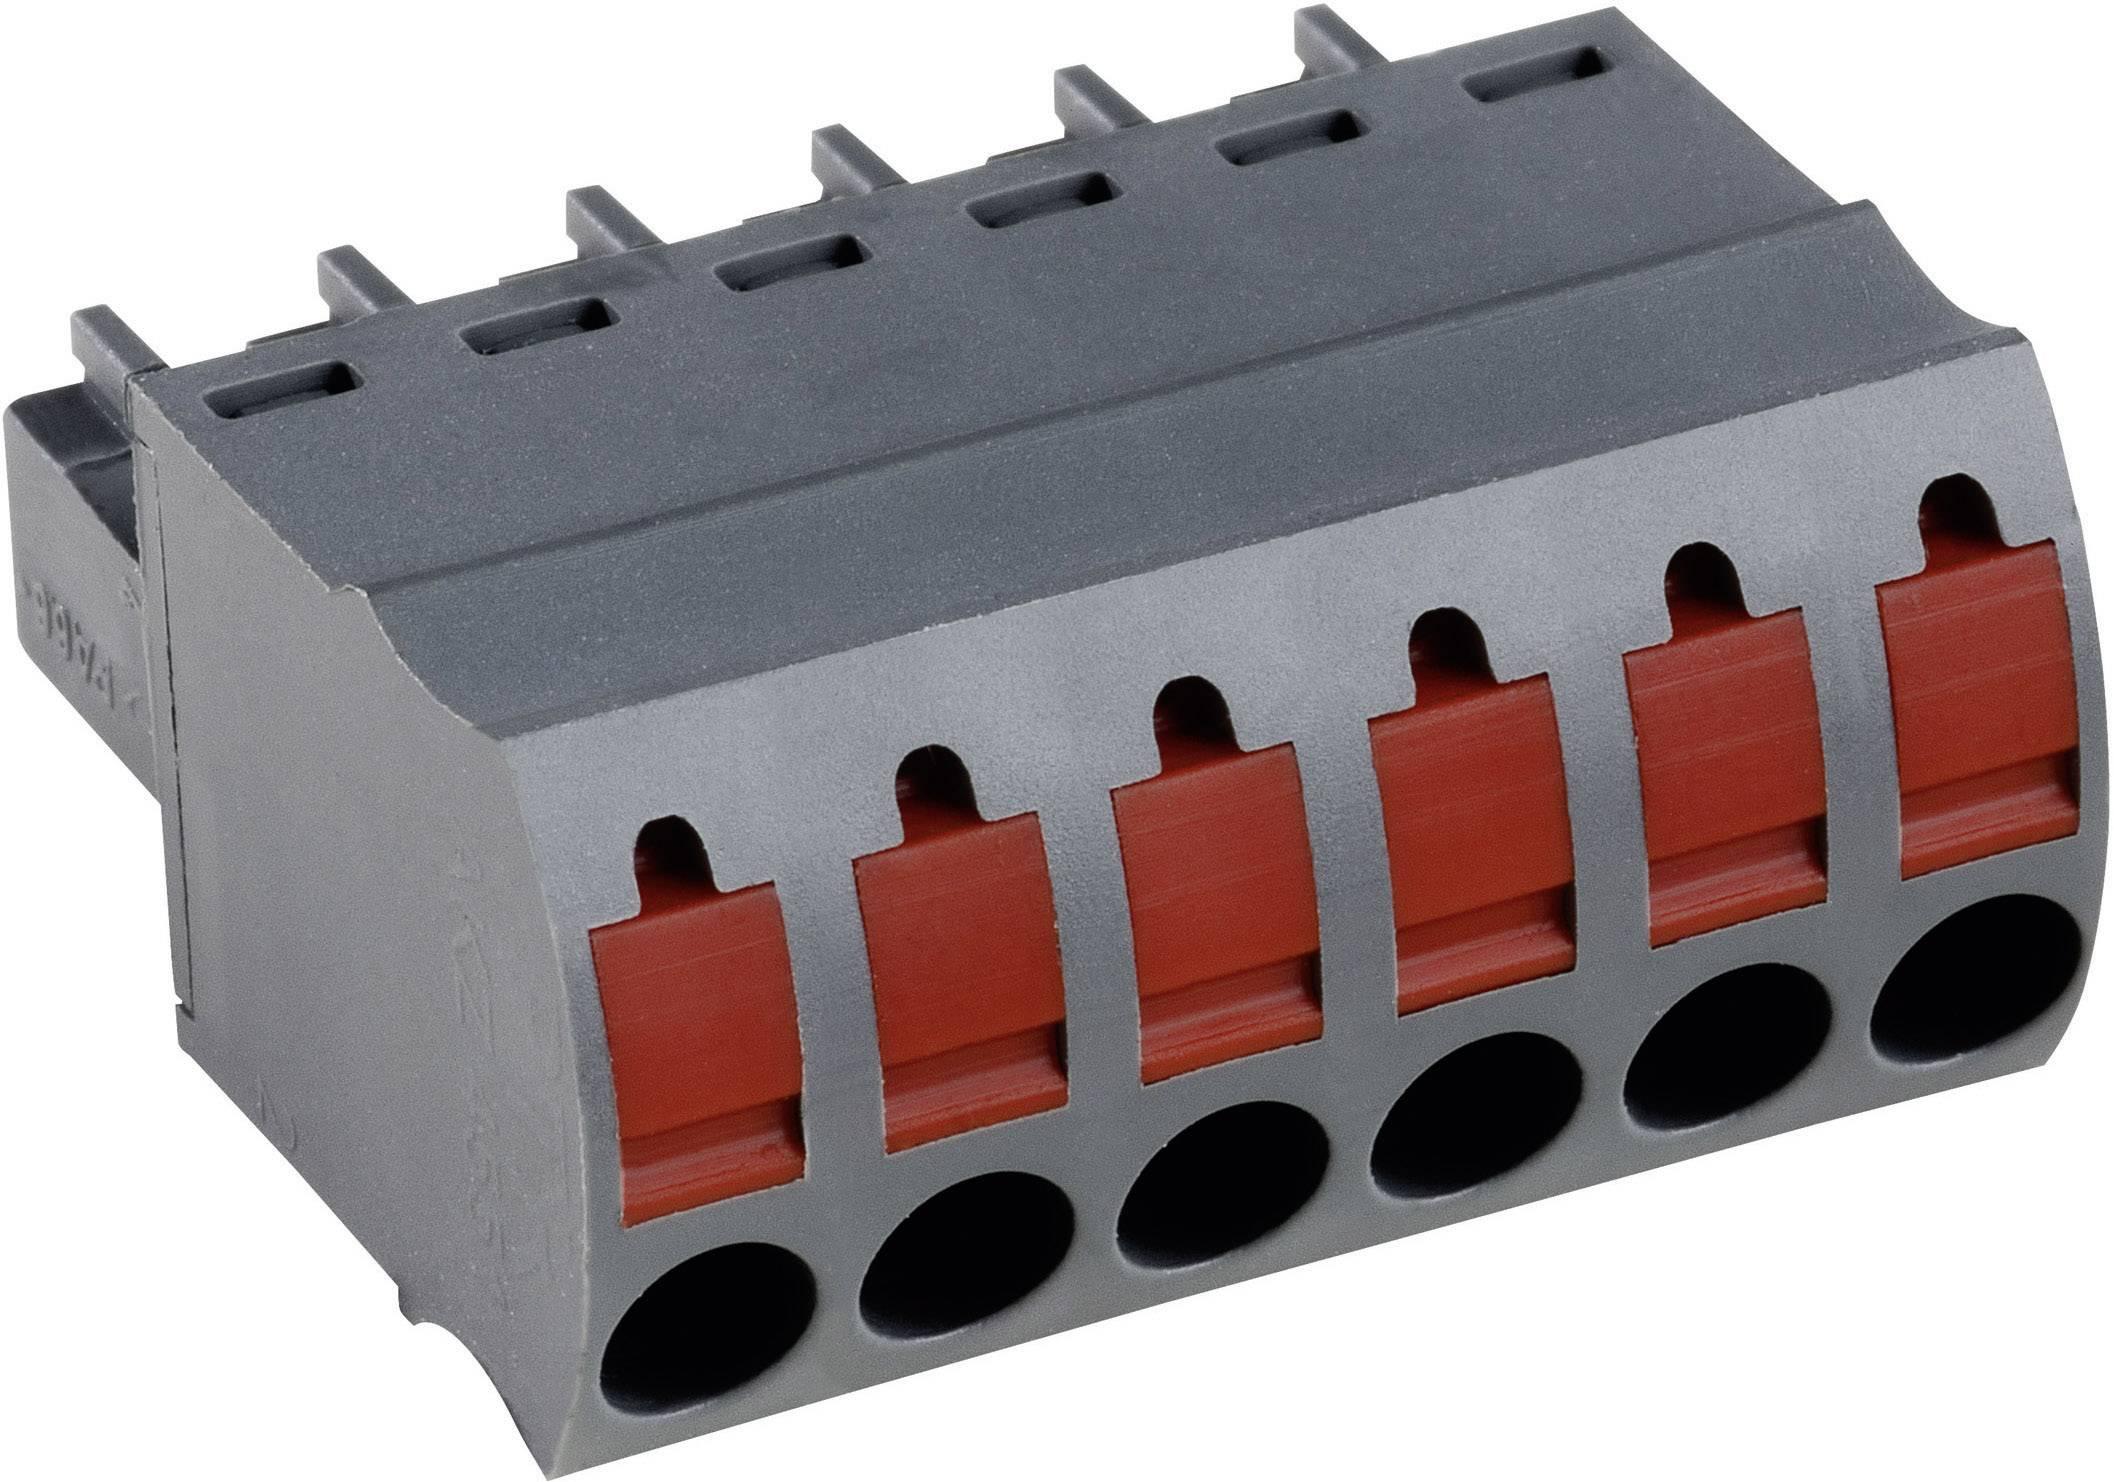 Zásuvkové púzdro na kábel PTR AKZ4551/12KD-3.81 54551120421D, 45.70 mm, pólů 12, rozteč 3.81 mm, 1 ks